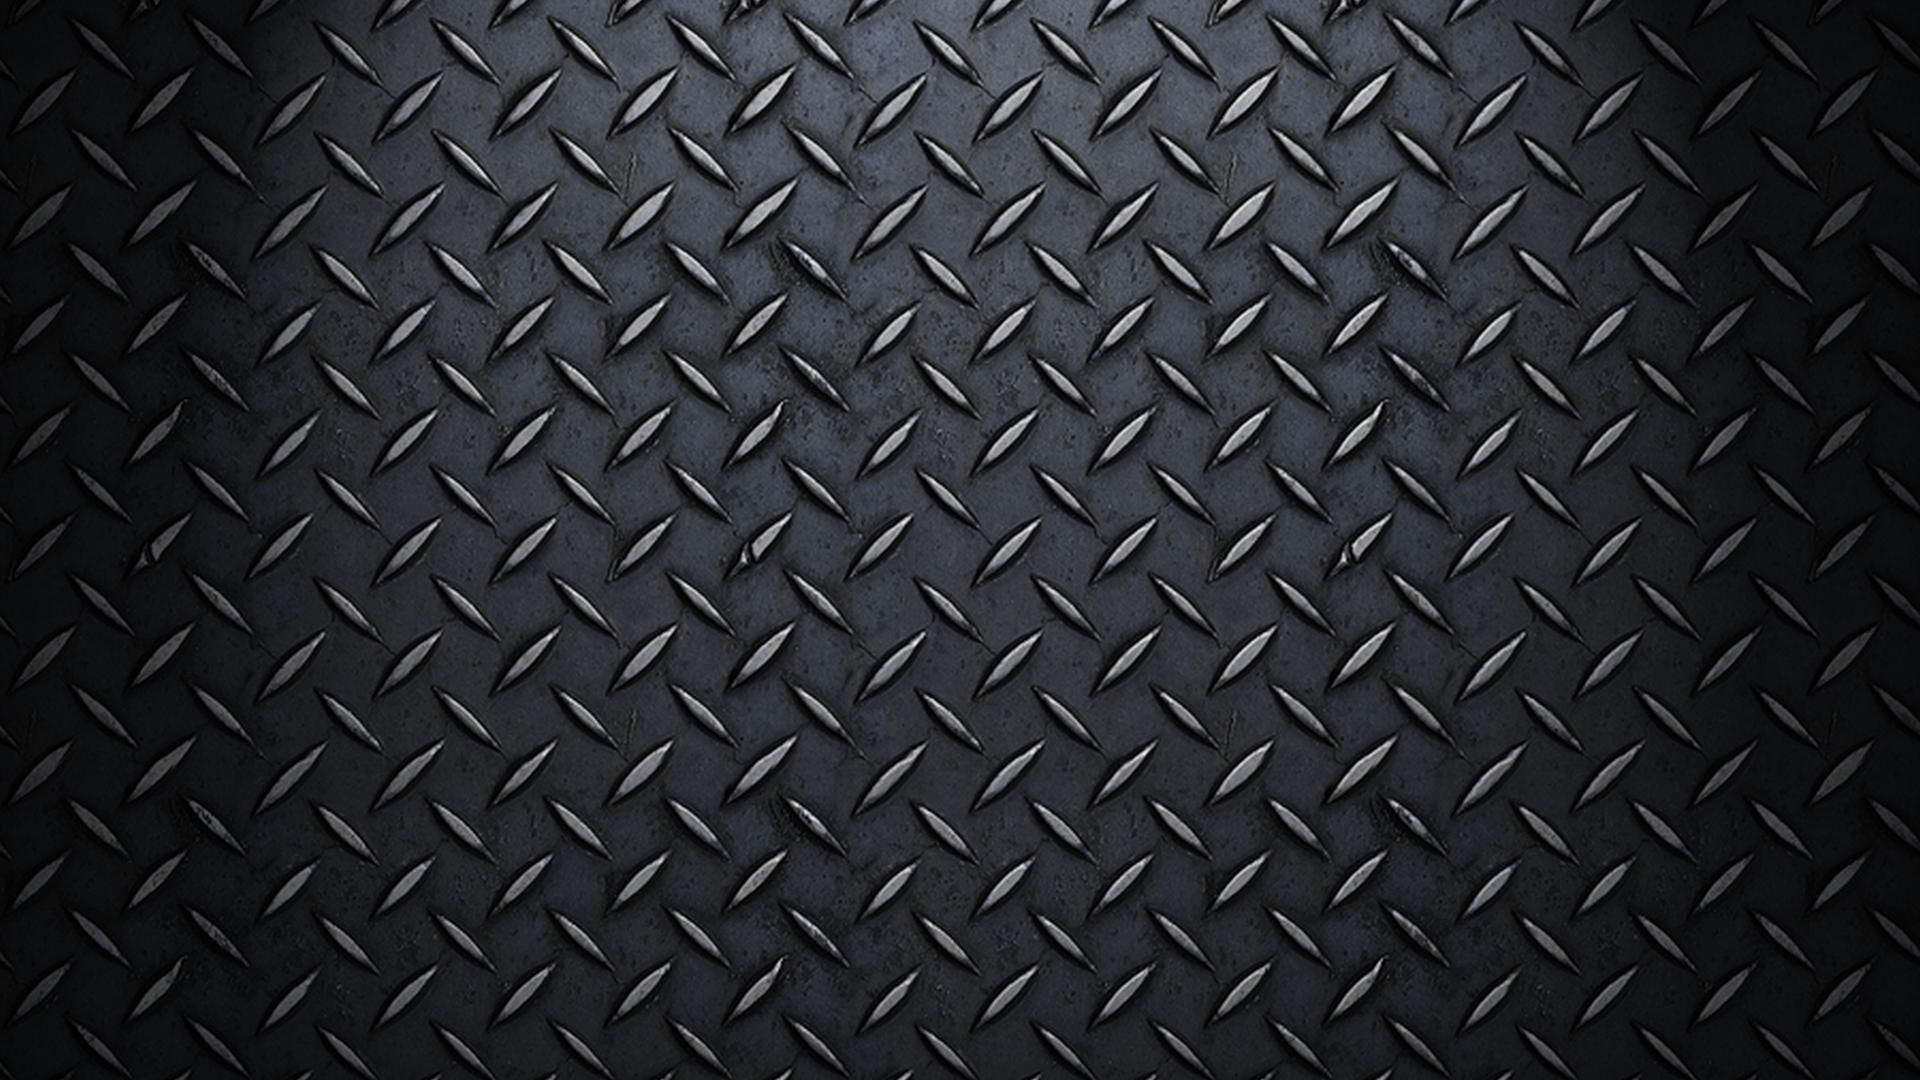 45 Black Diamond Wallpaper On Wallpapersafari